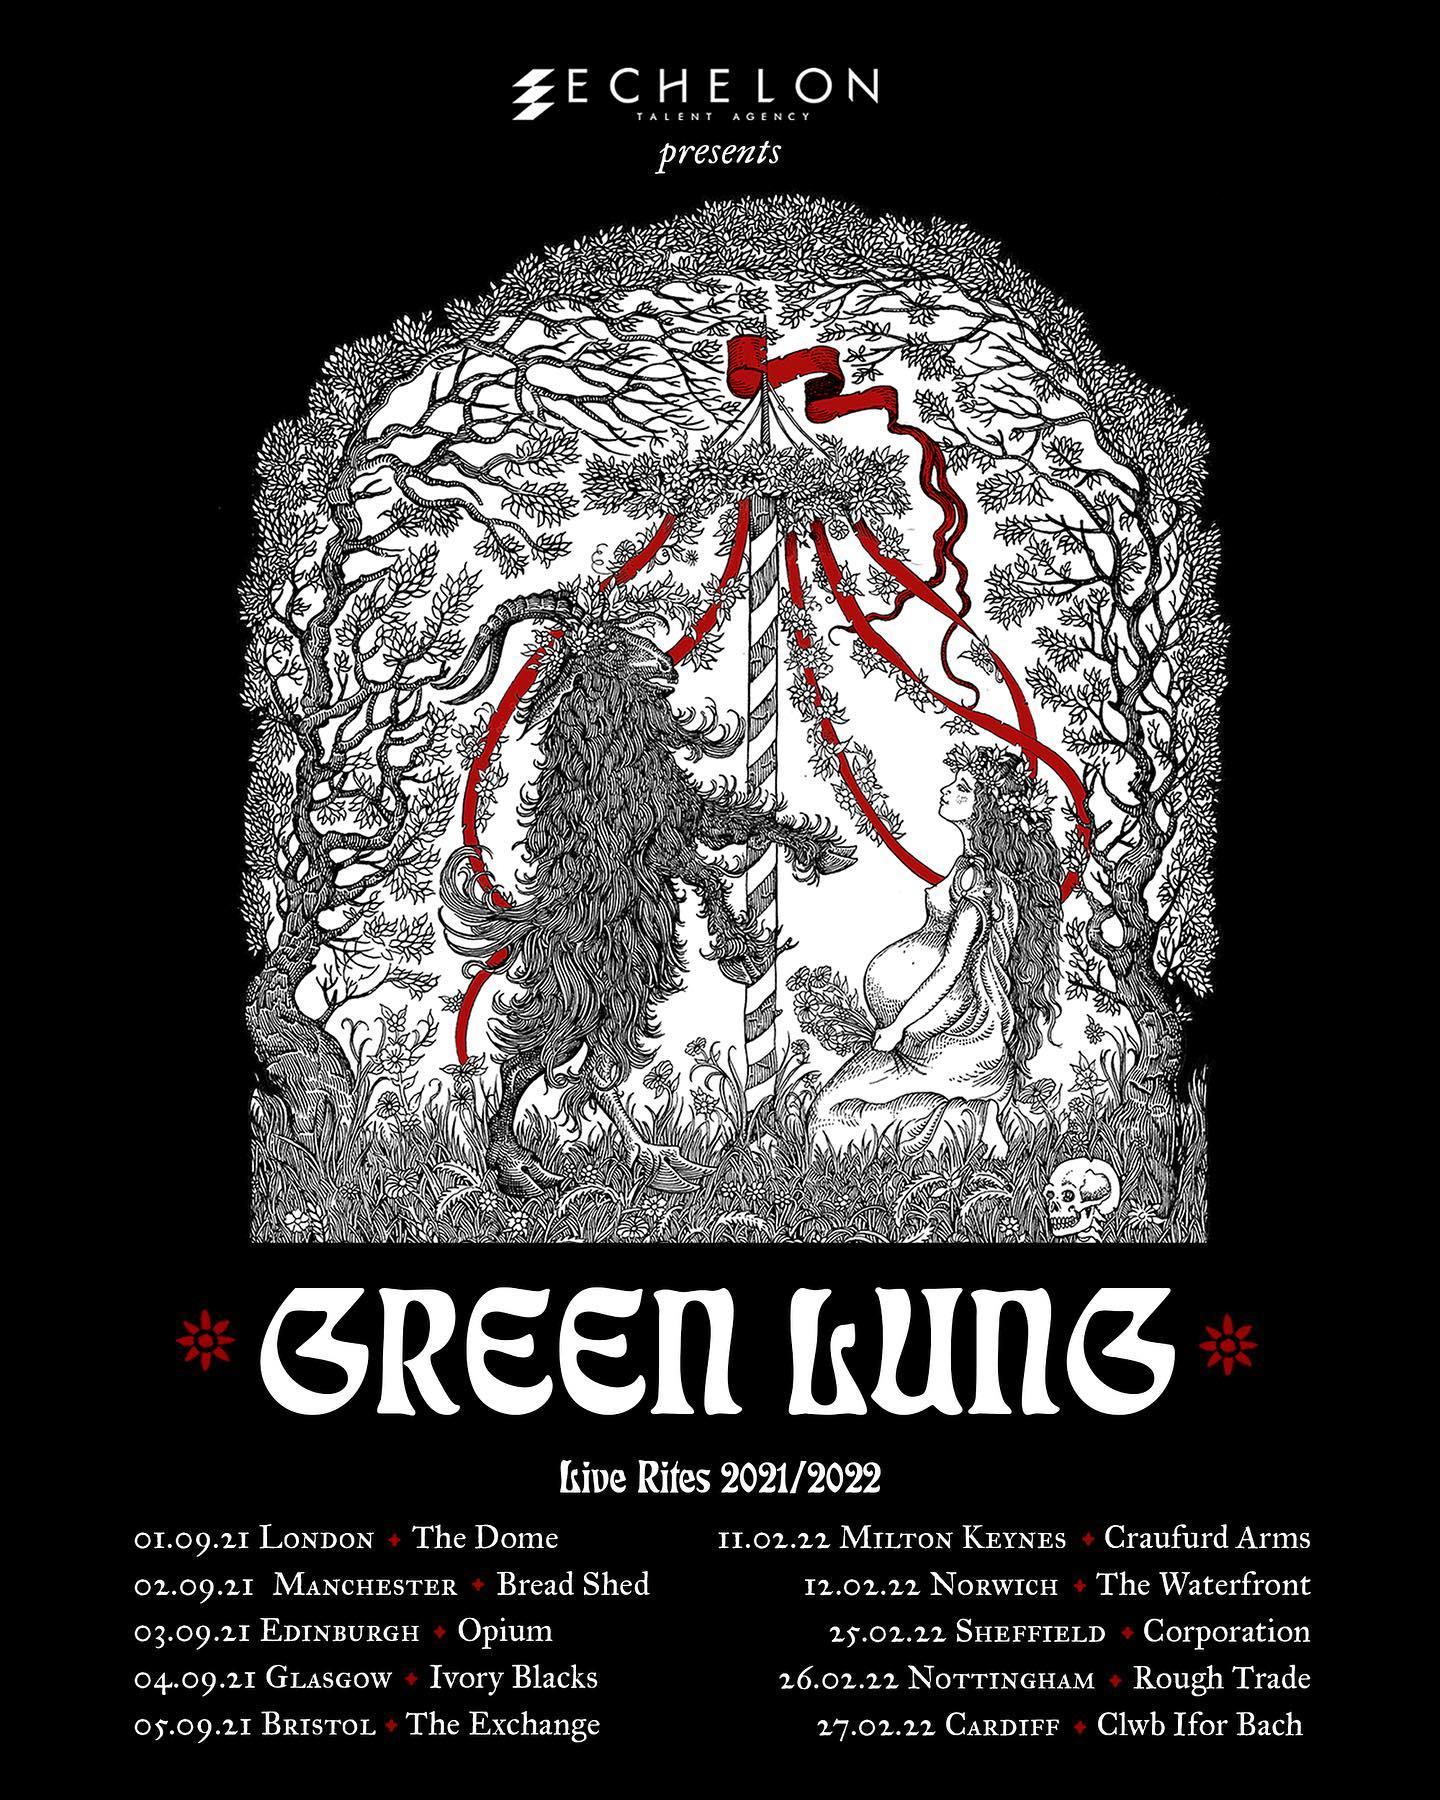 green lung tour dates